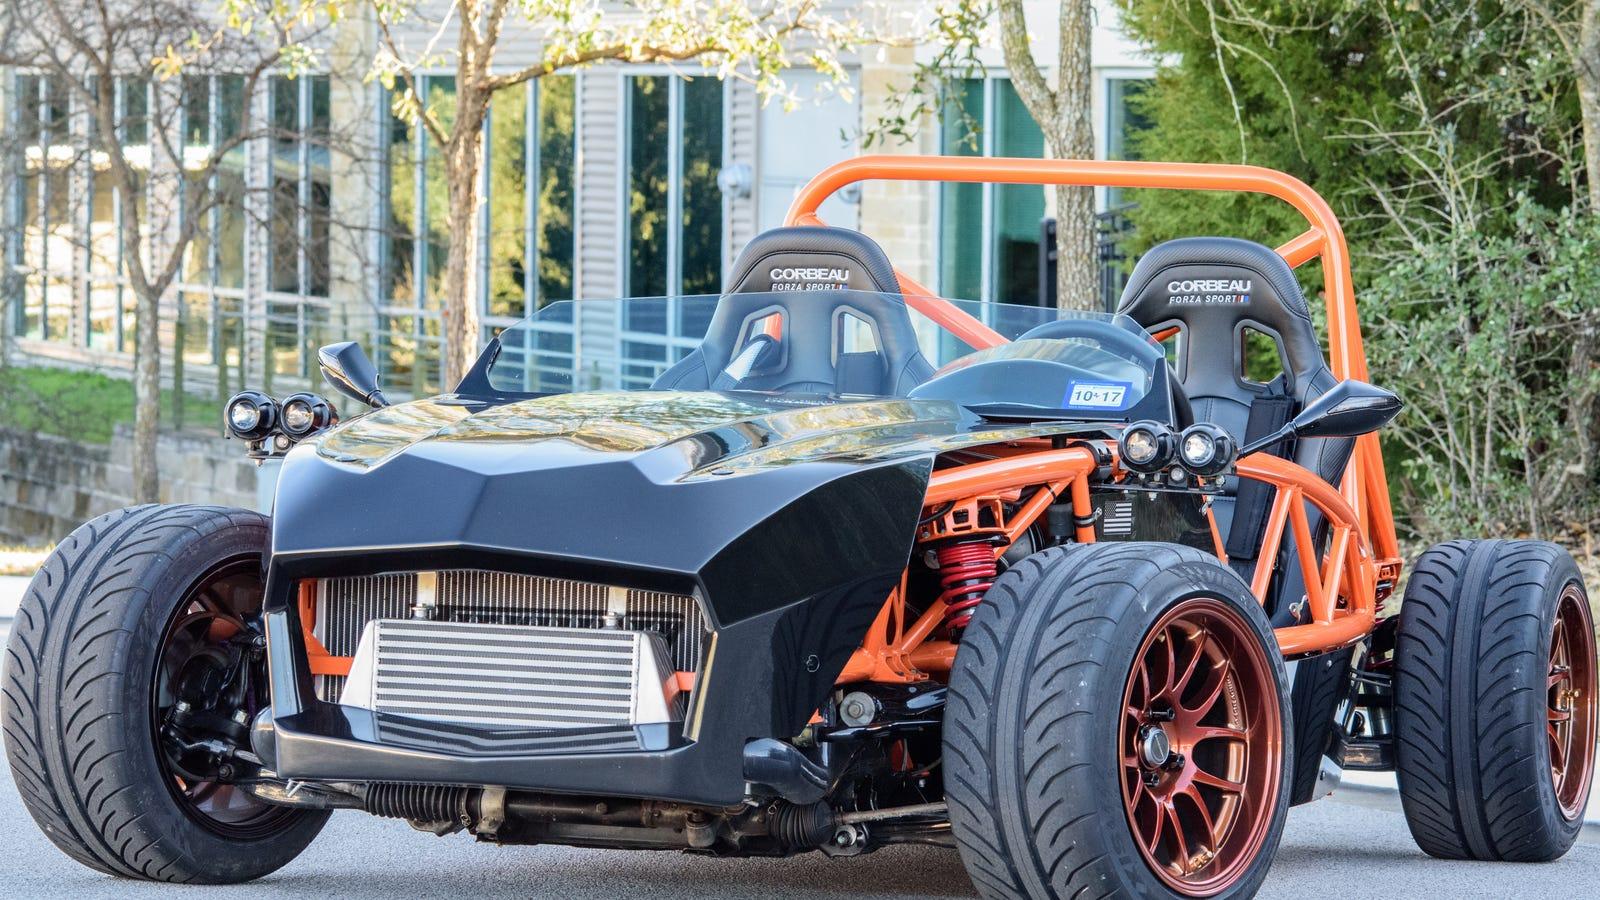 Driving A Stripped-Down Turbo Miata Kit Car: Doors Are